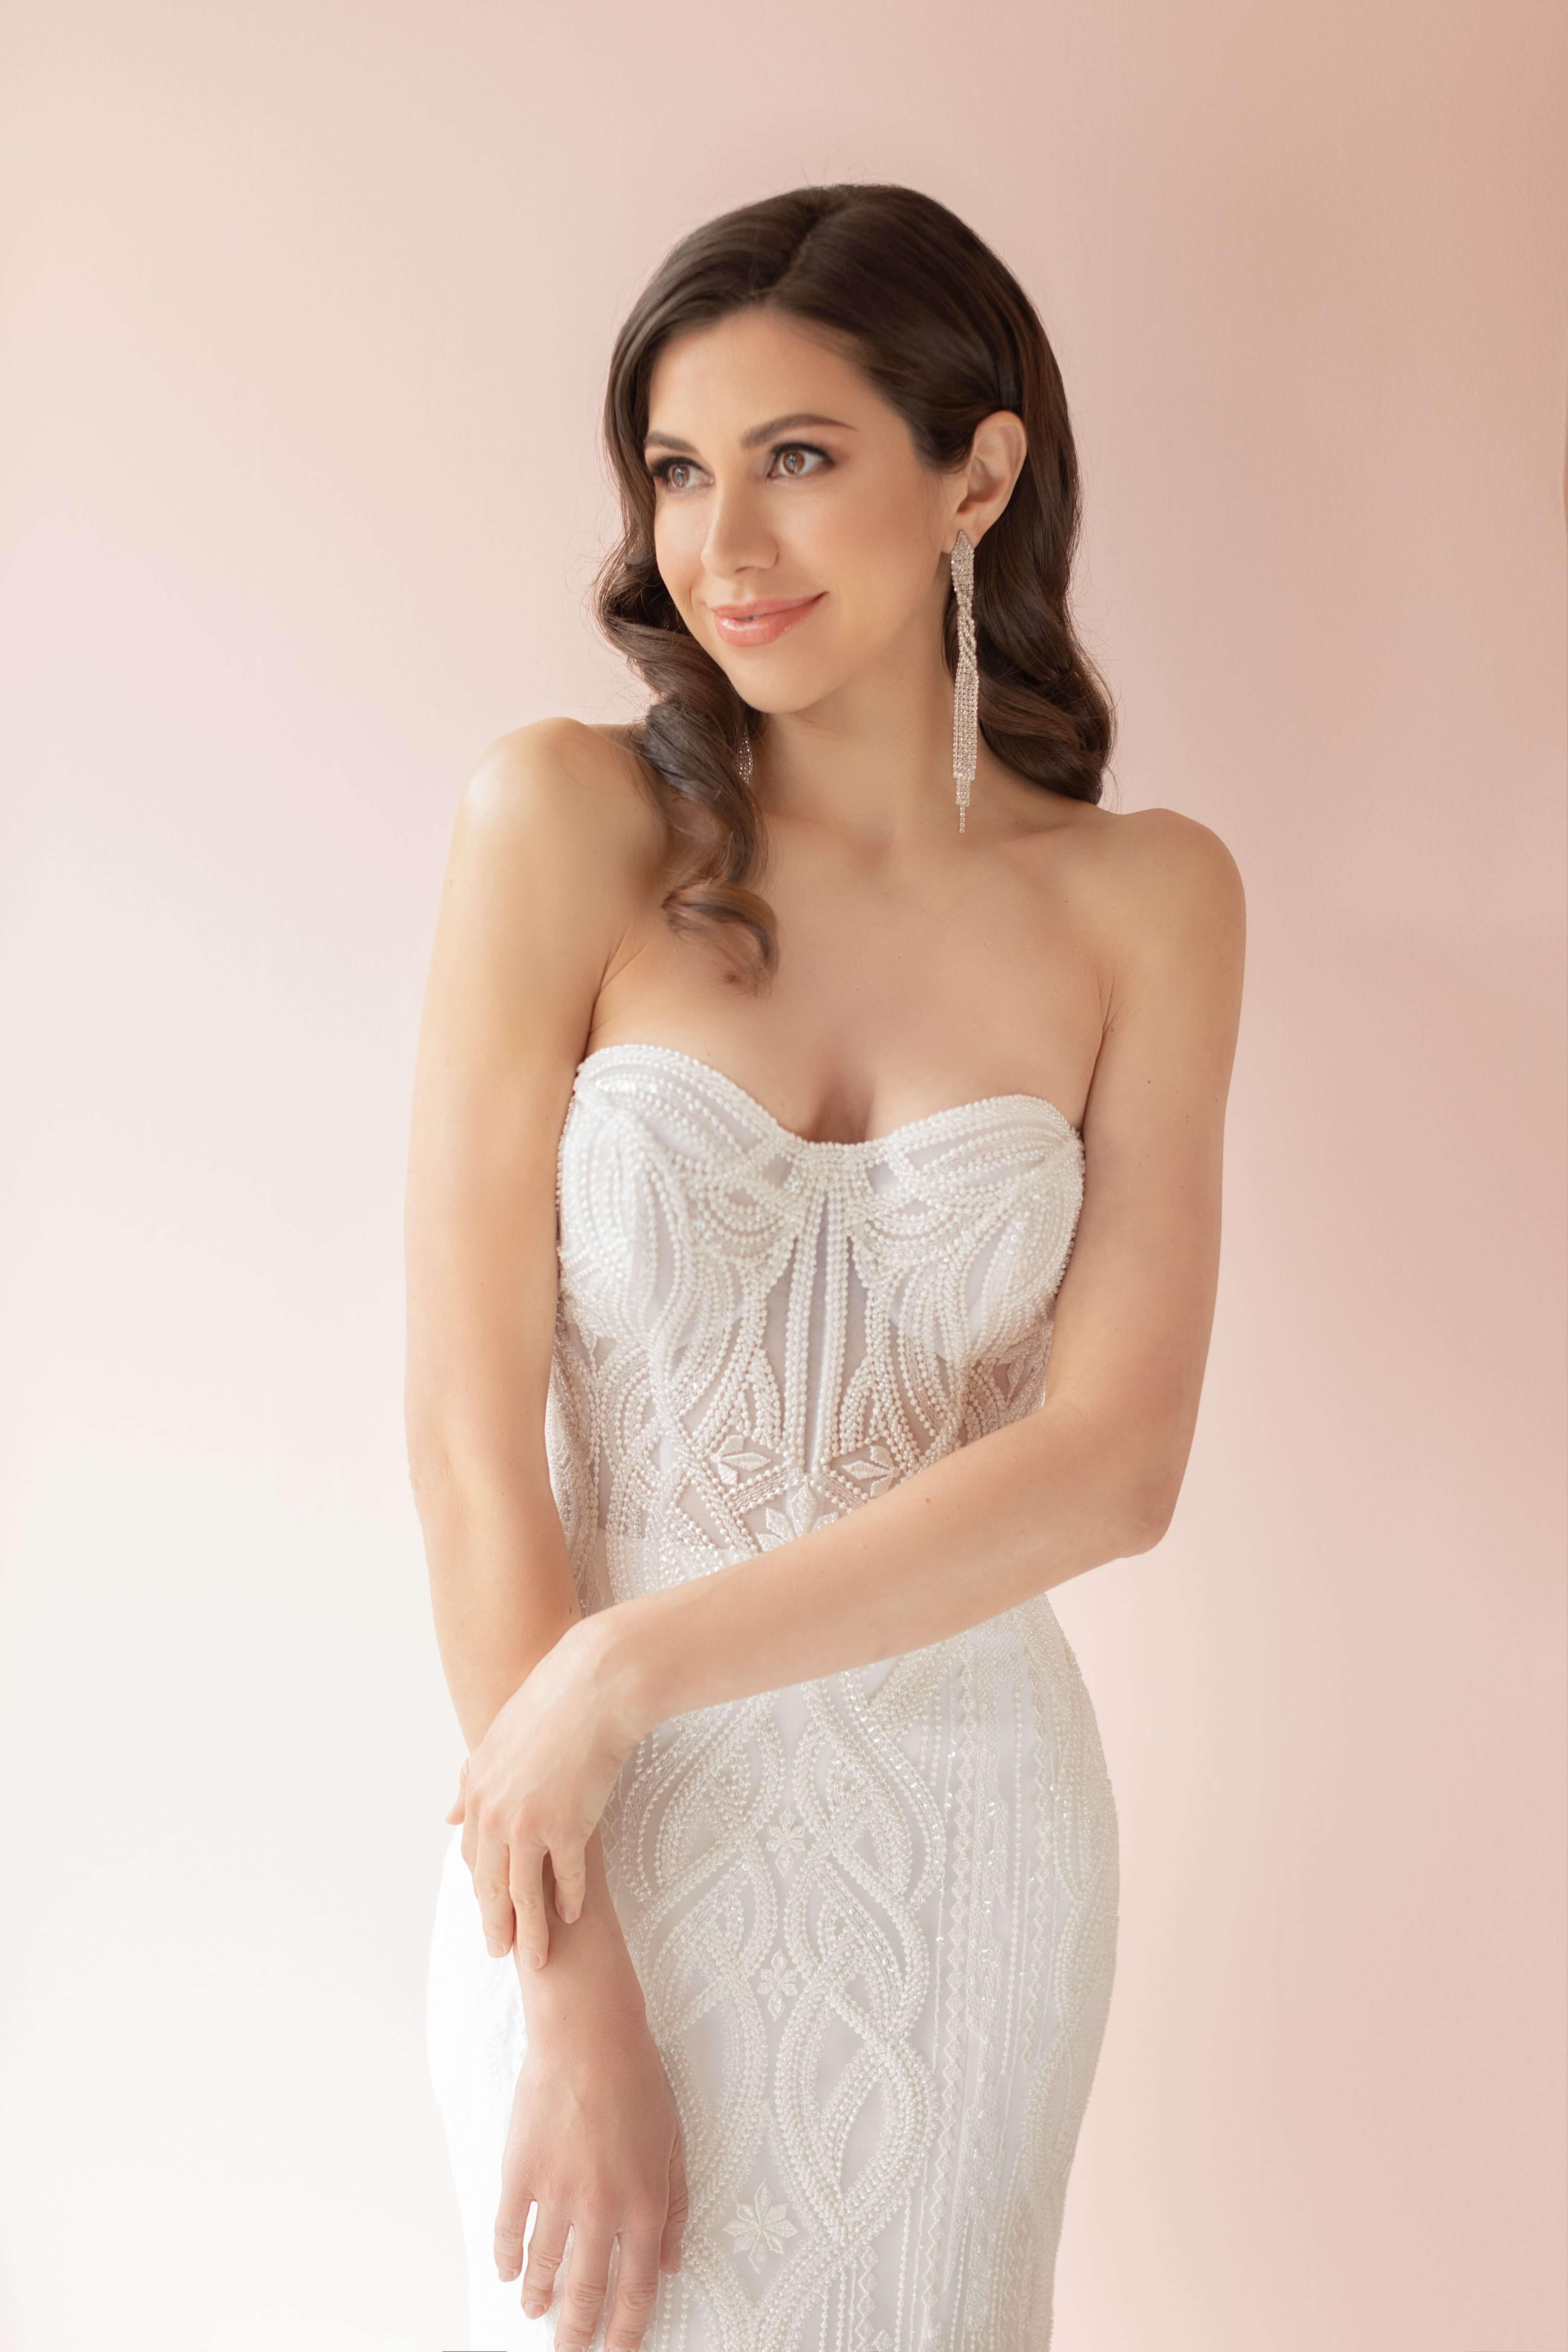 luxury wedding dress designer weding gown montreal lilia haute couture